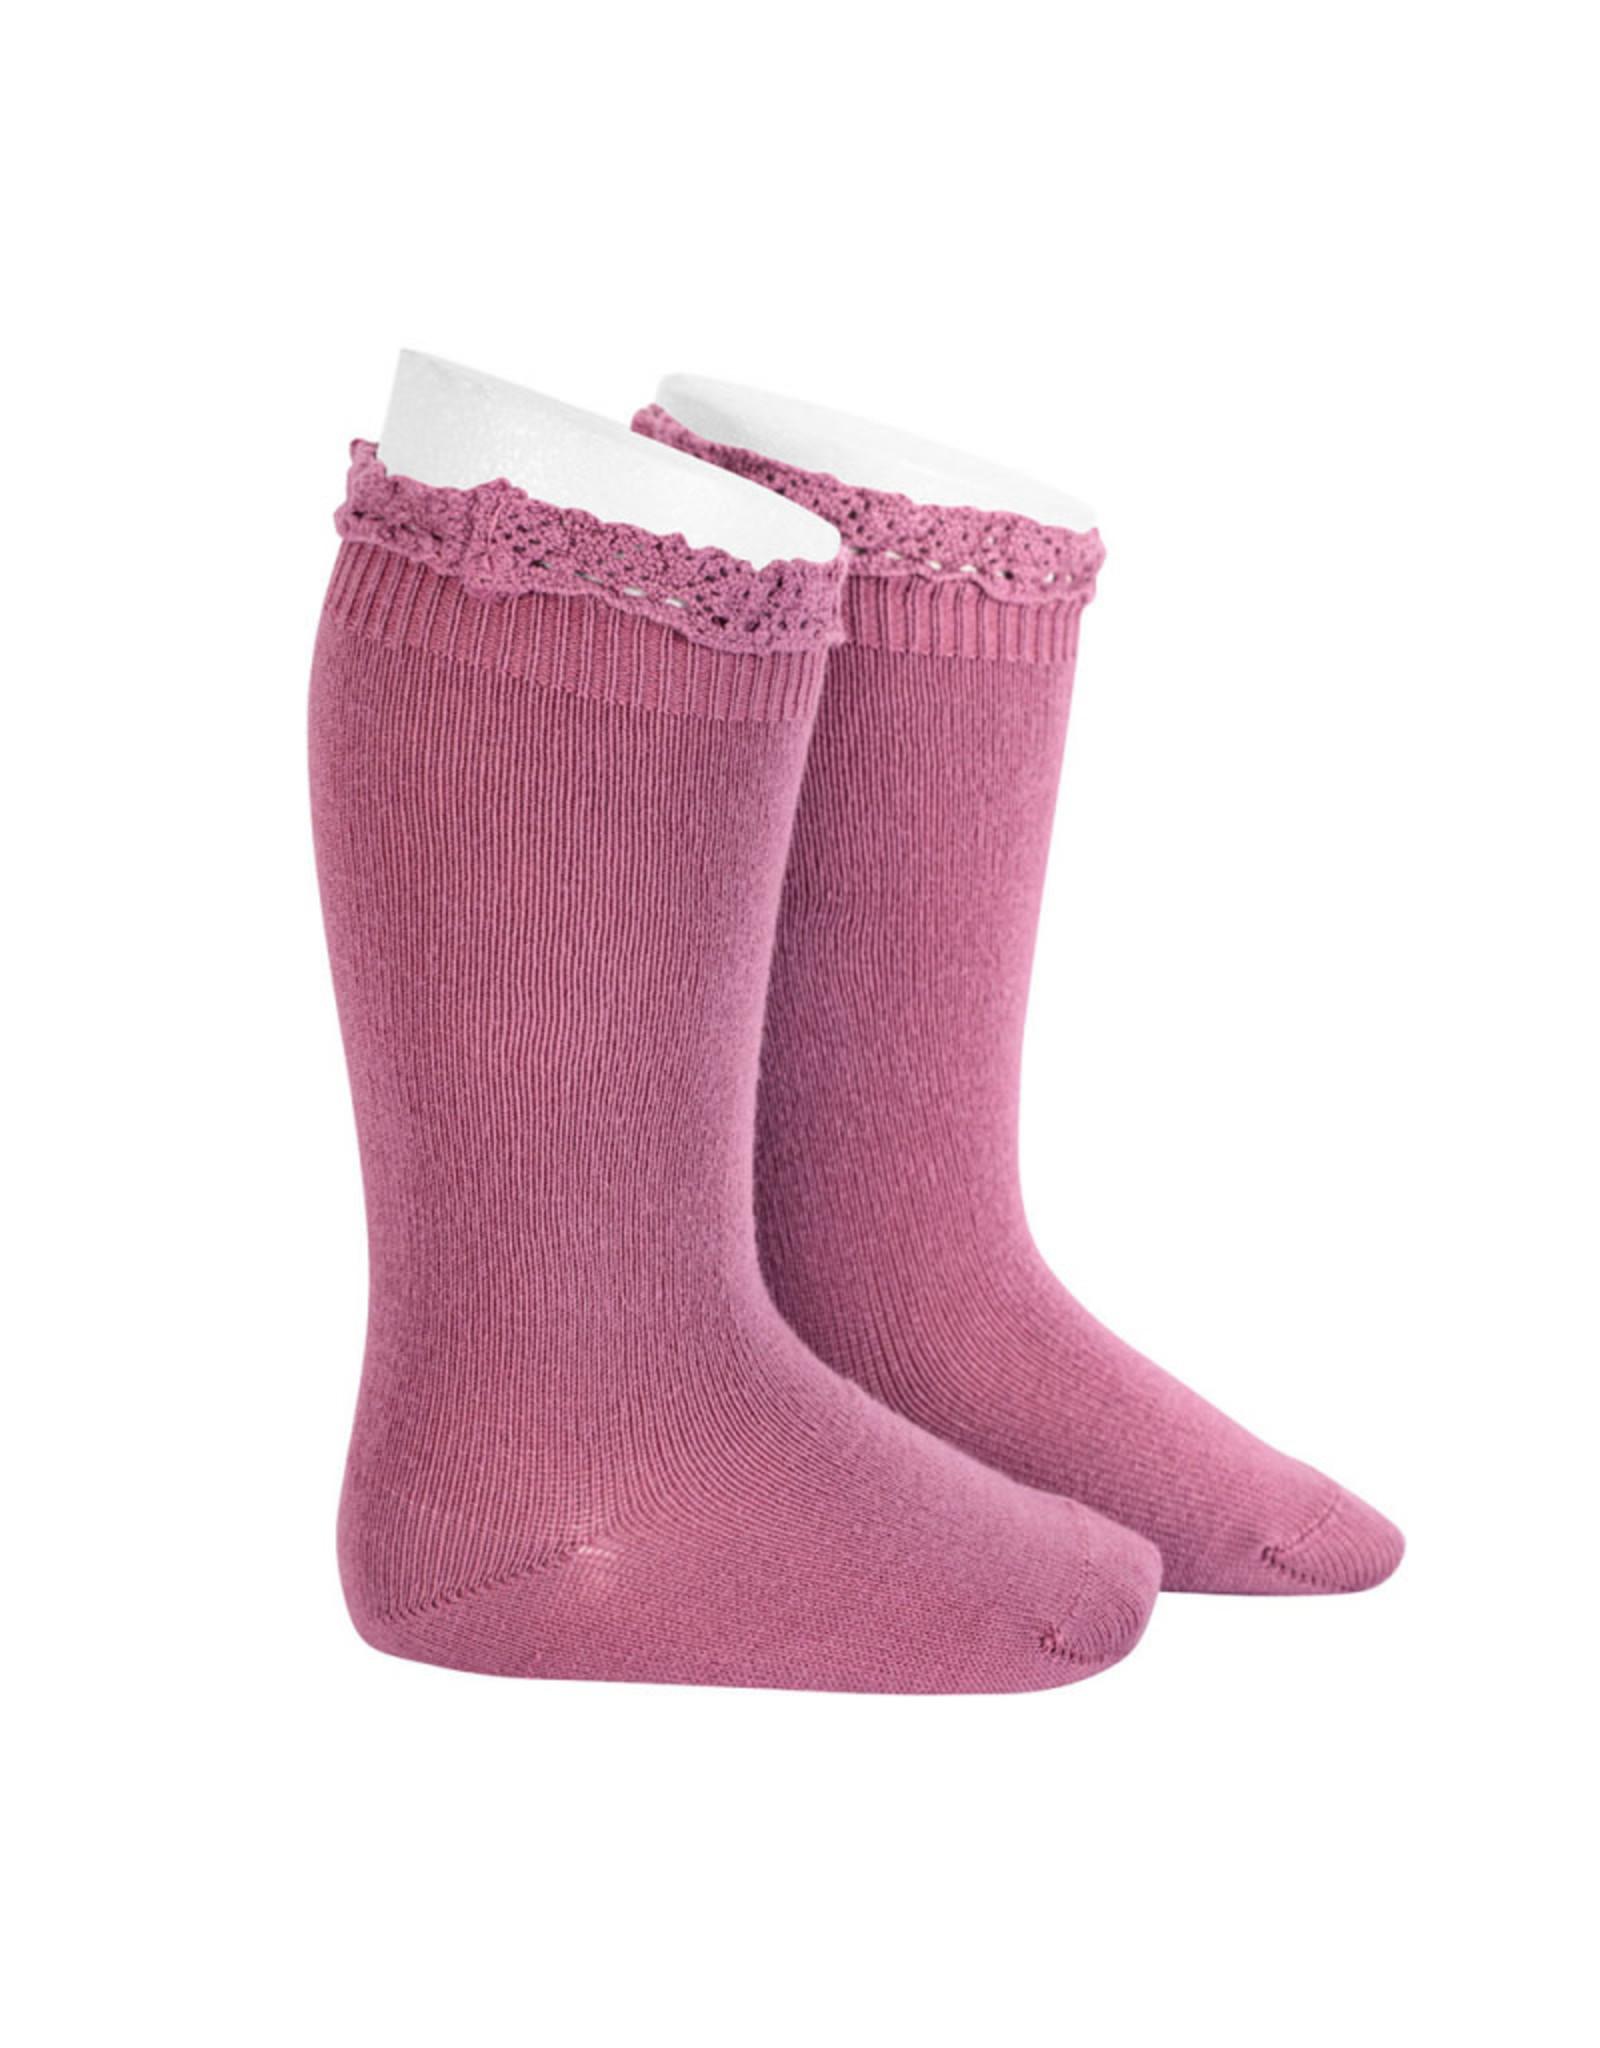 CONDOR Cassis Lace Edging Knee Socks